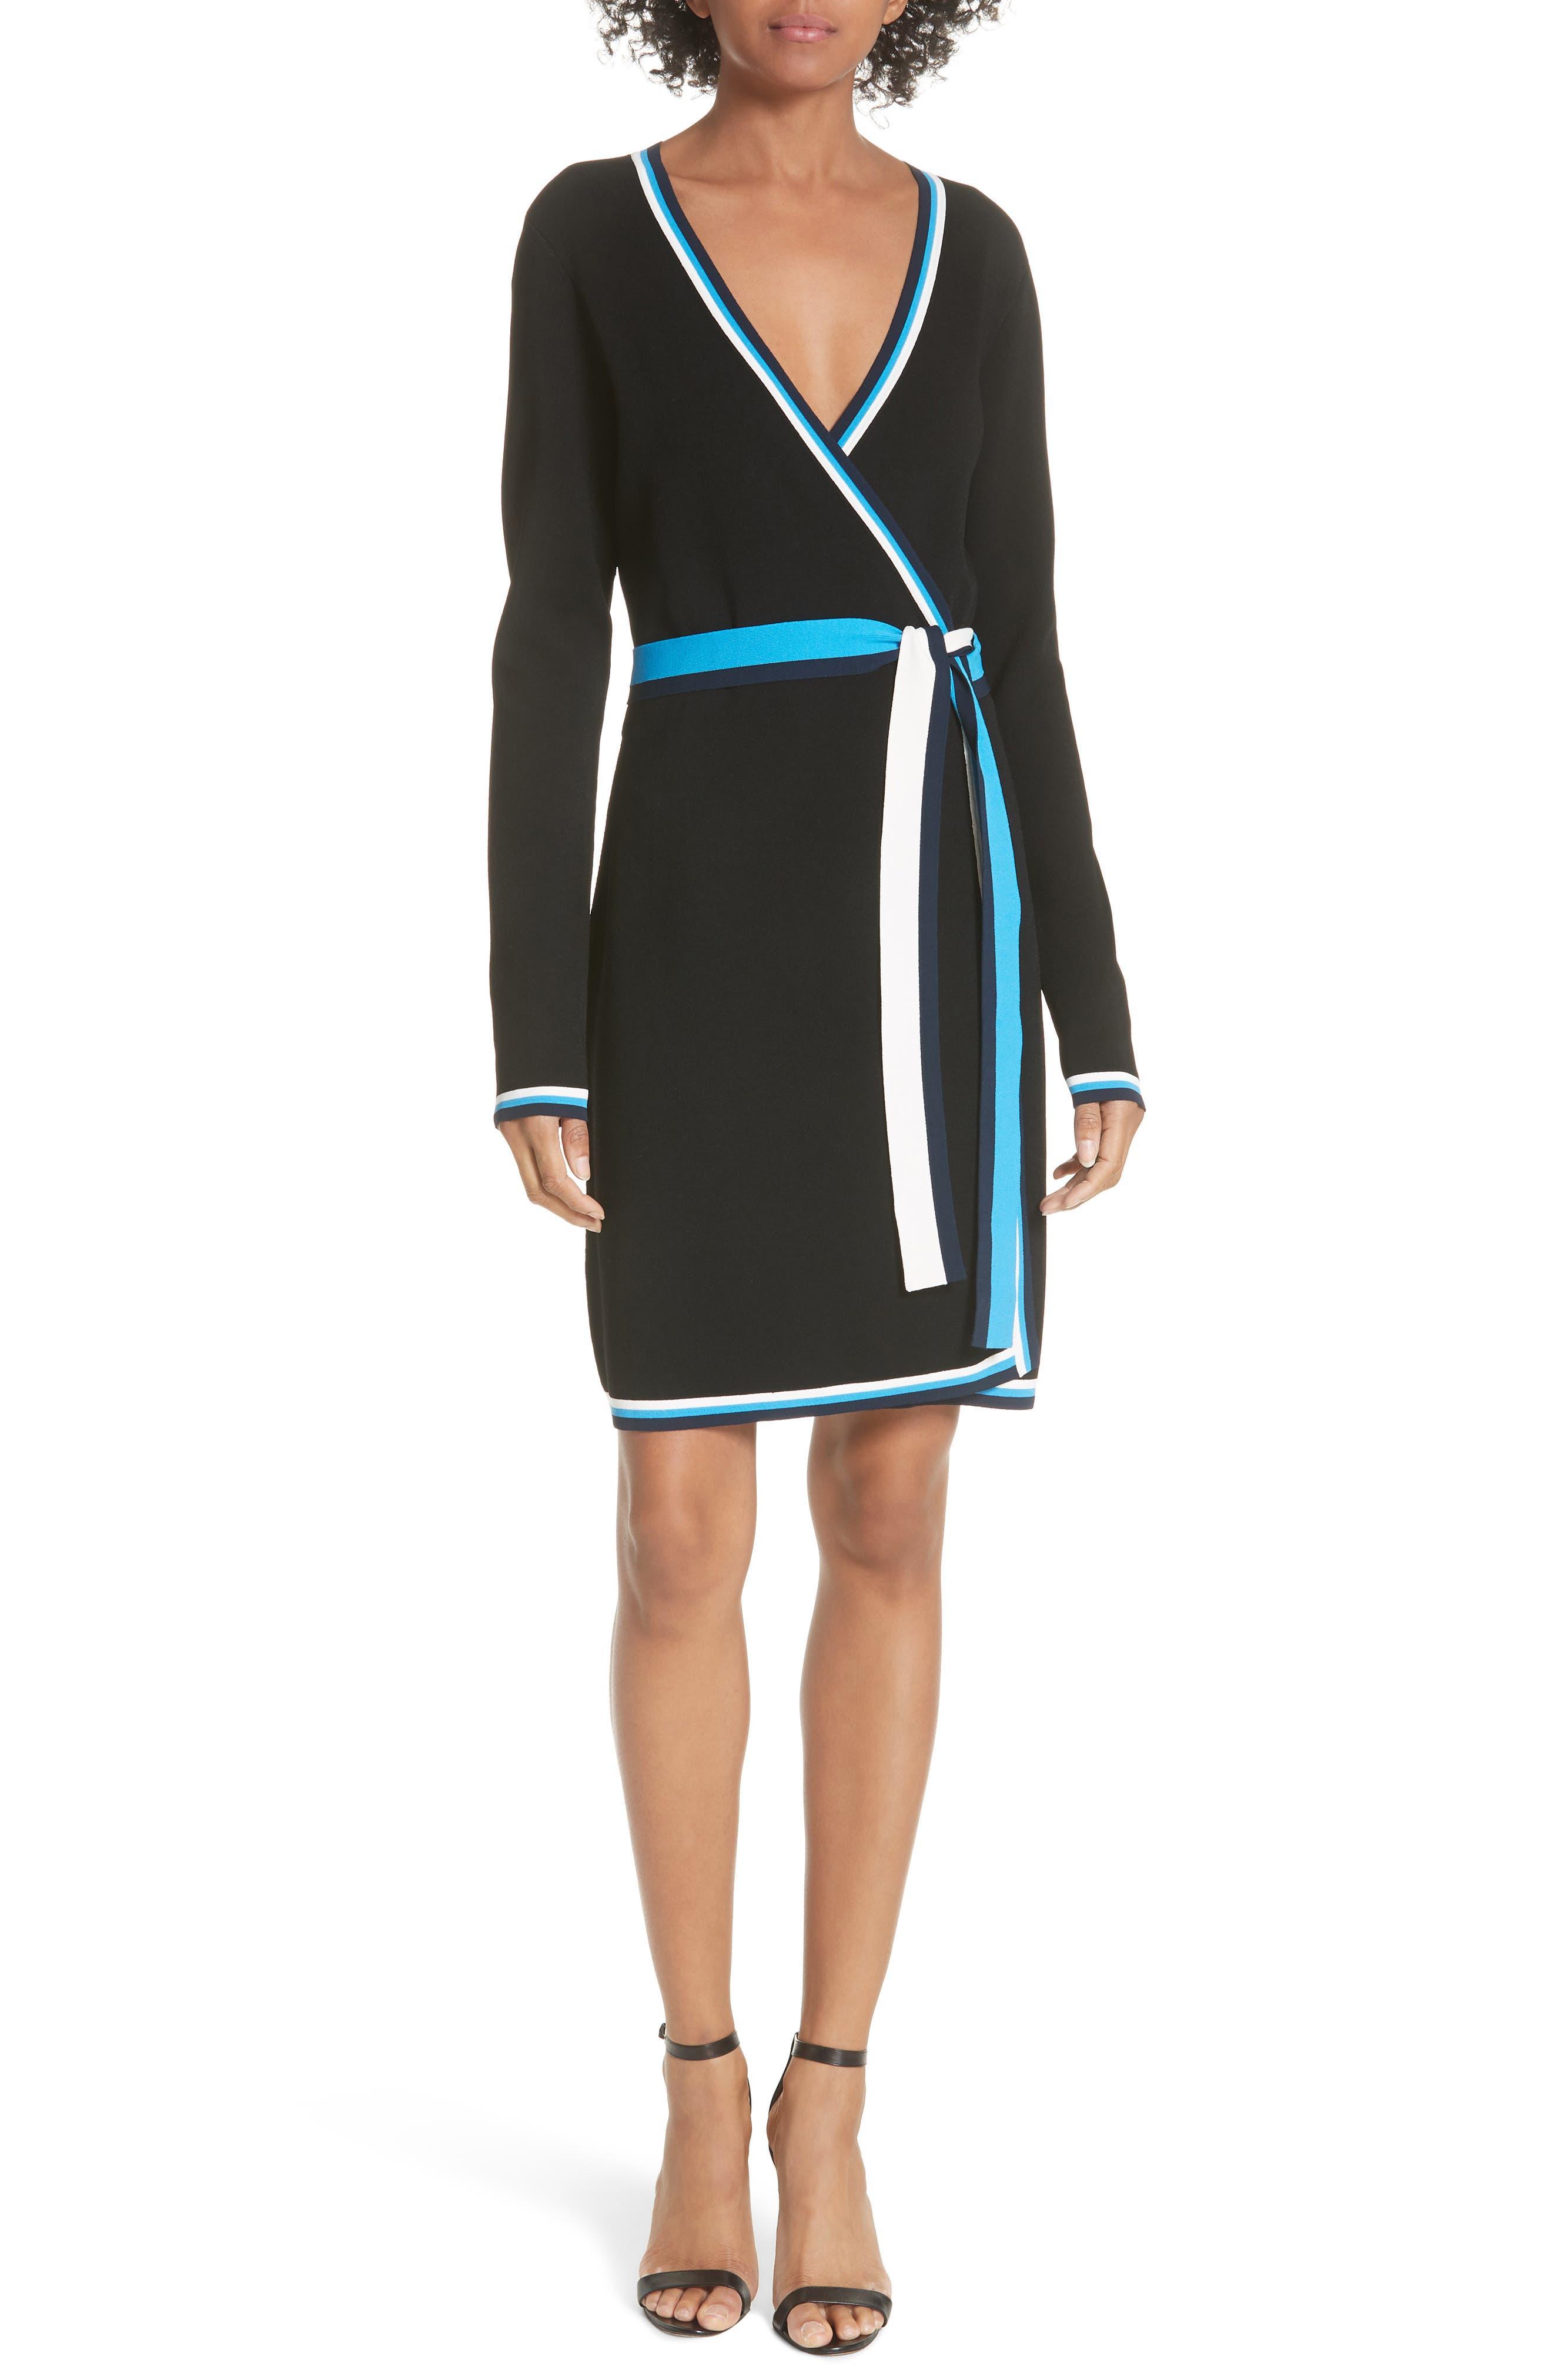 Diane von Furstenberg Wrap Sweater Dress,                             Main thumbnail 1, color,                             006